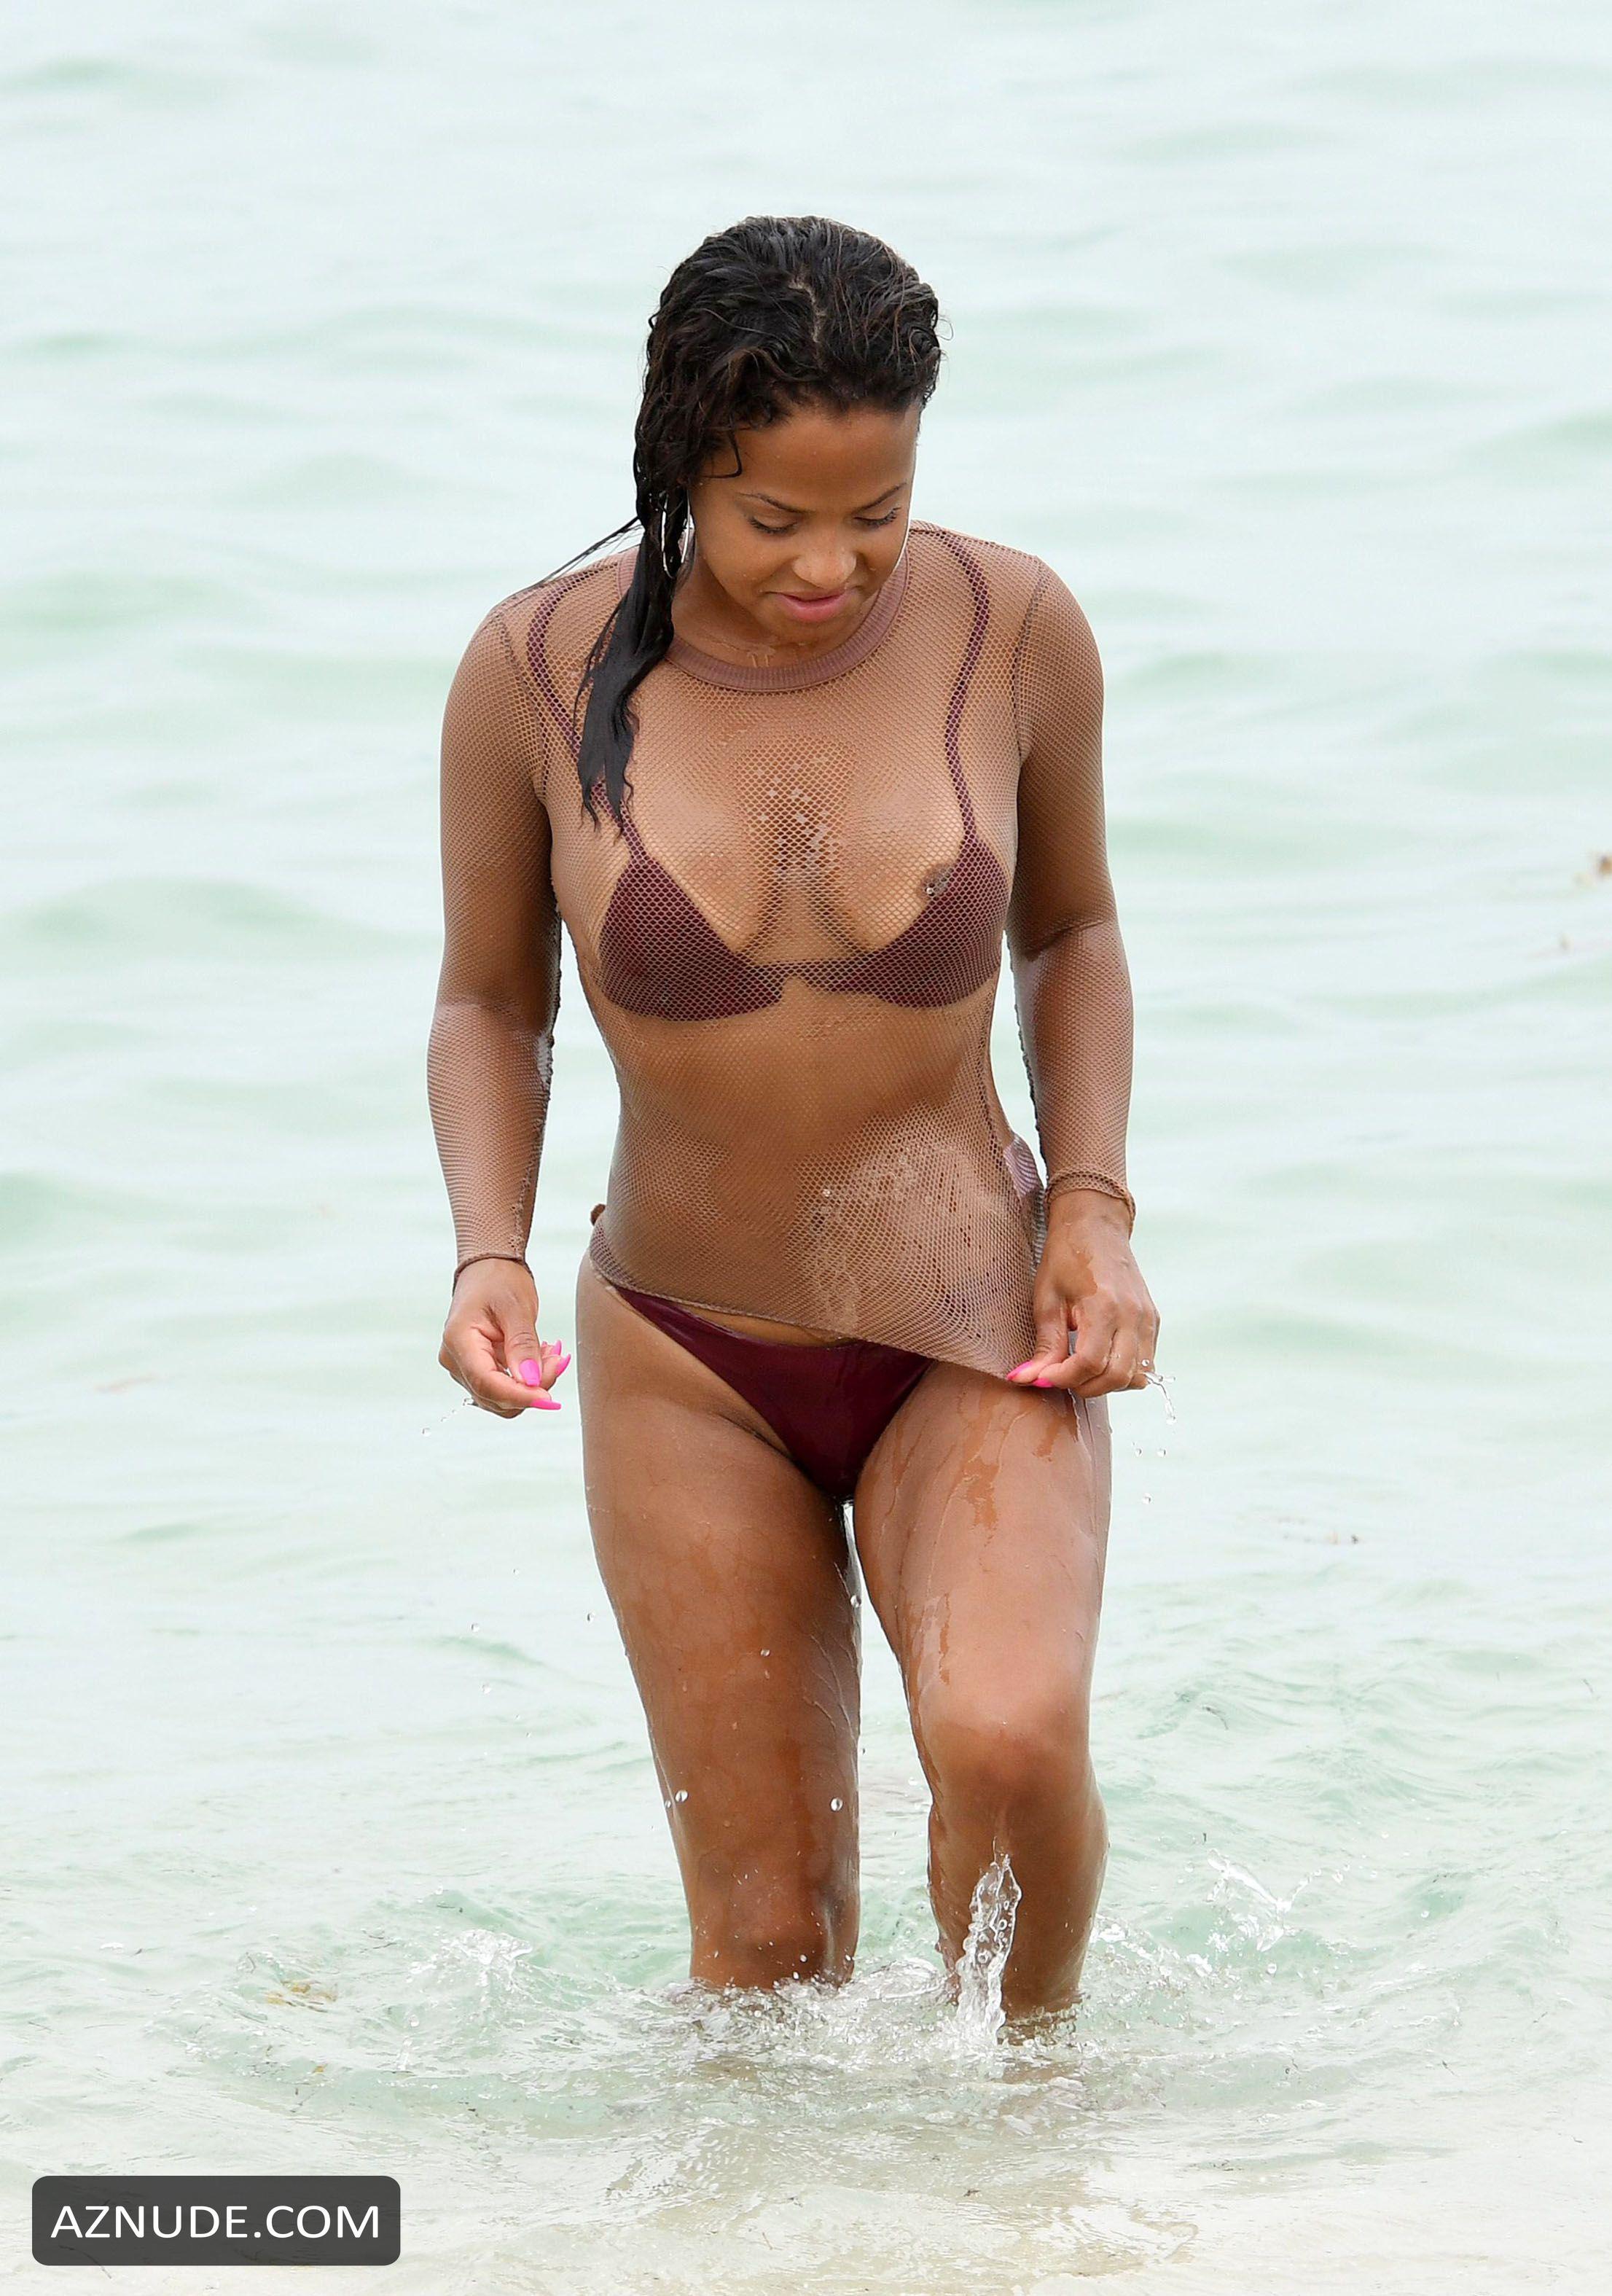 Christina Milian Sexy Bikini Pics In Miami Erotic Photos Of Celebrities And Sexy Actresses